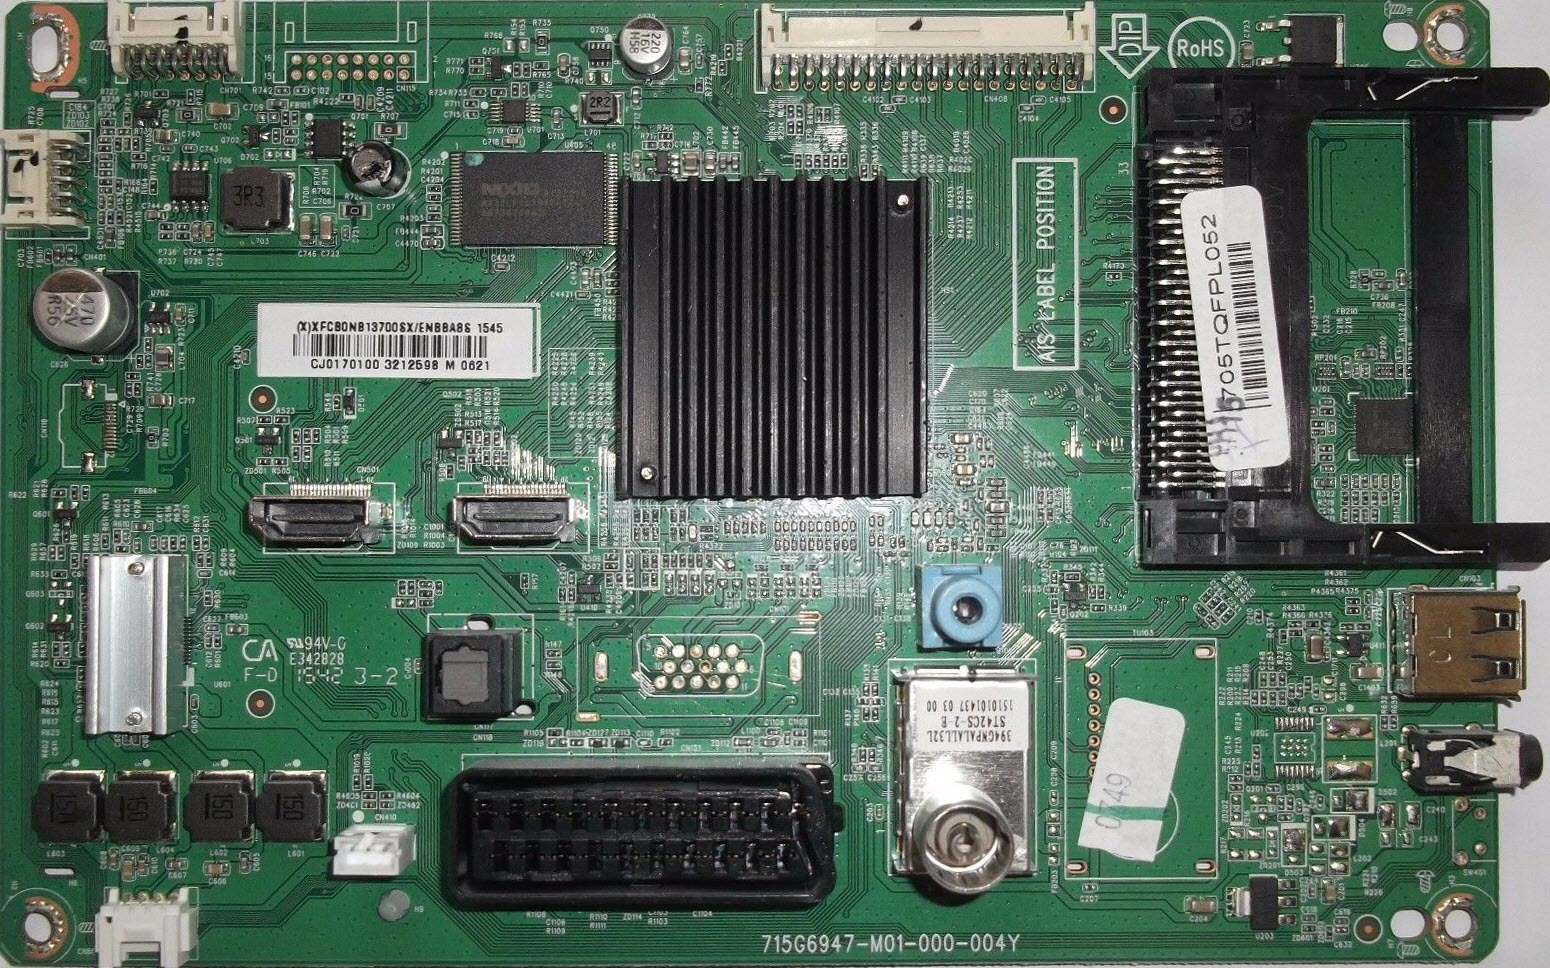 телевизор philips 32 pfl4508t/60 инструкция по применению